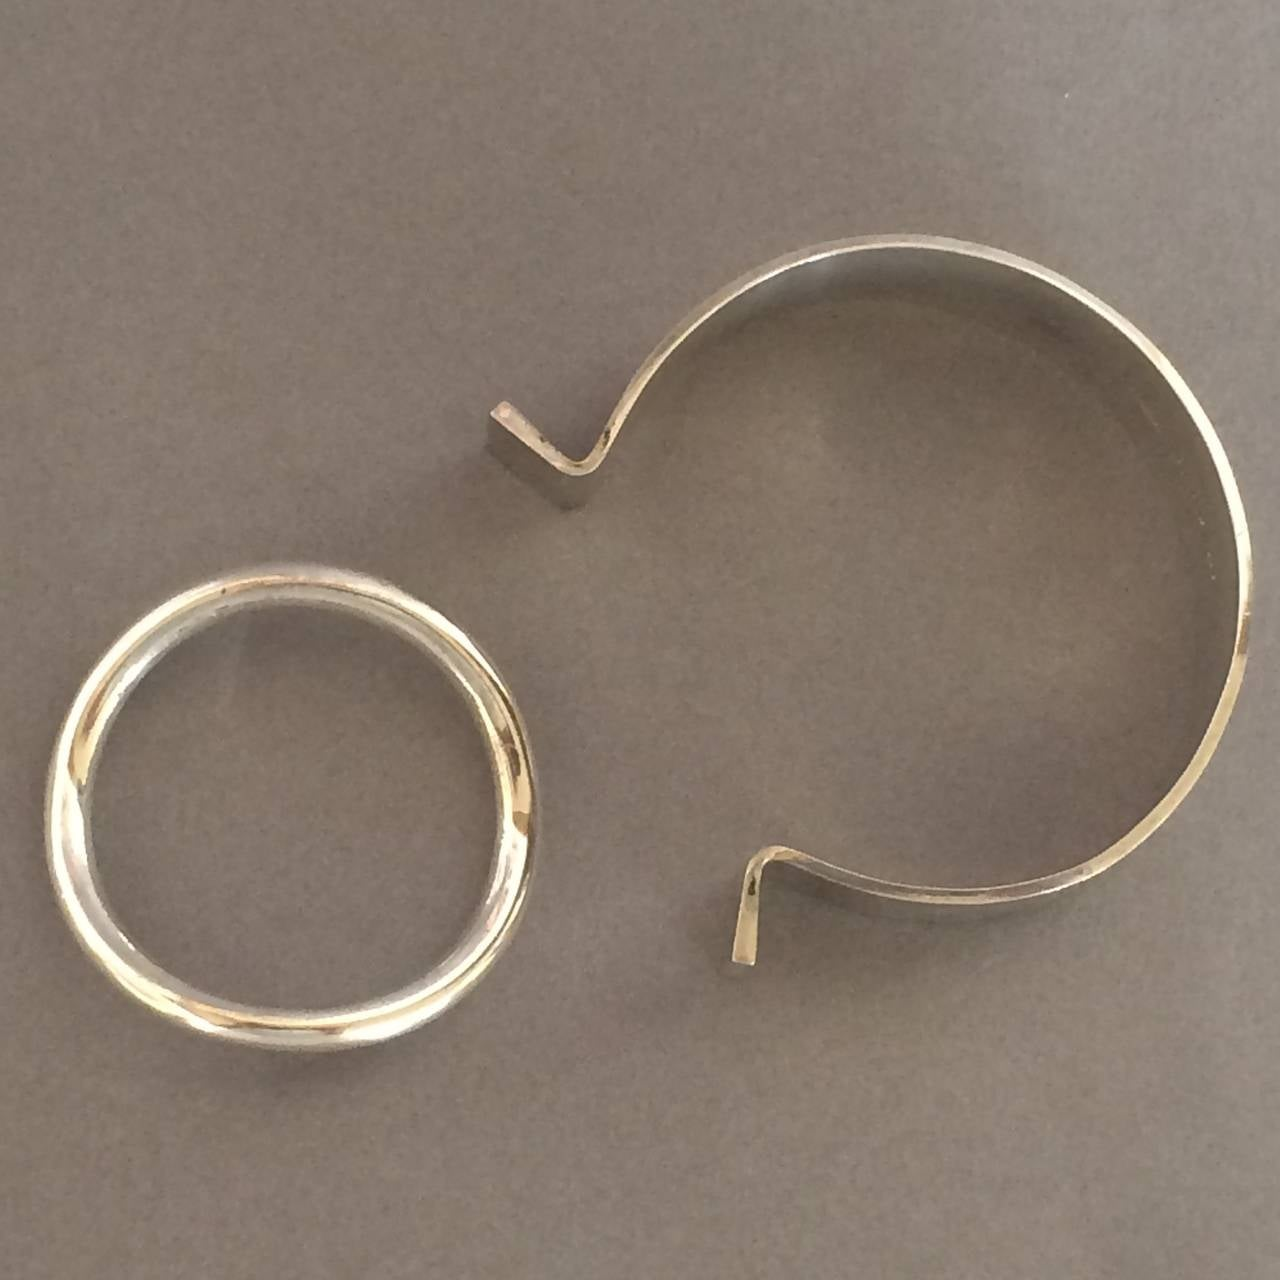 "Hans Hansen Modernist Cuff ""Ring"" Bracelet designed by Bent Gabrielsen 3"